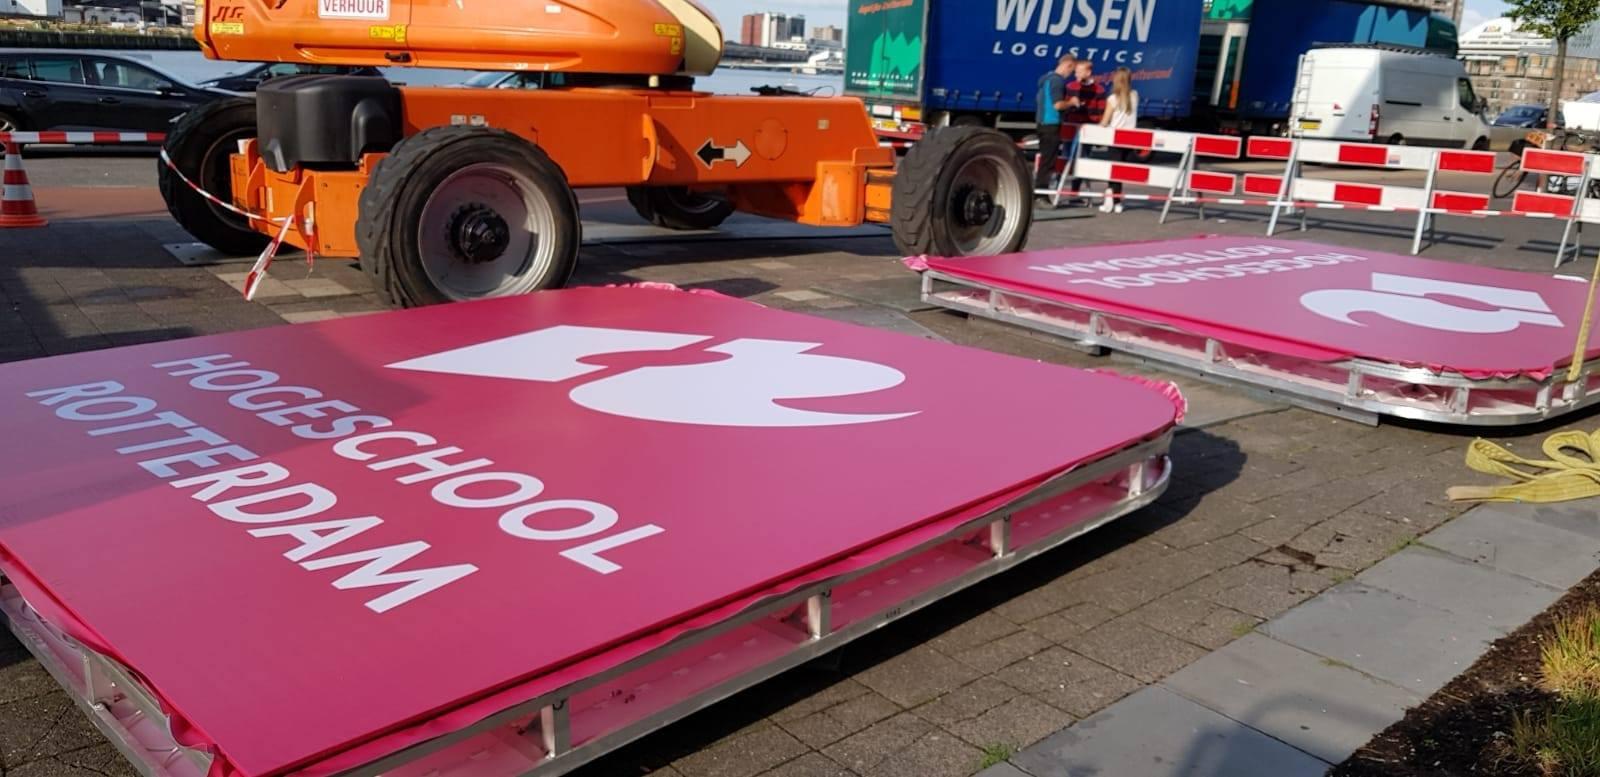 Koningin Maxima – Hogeschool Rotterdam – Korteland Reclame - gevelreclame - logo roze liggend